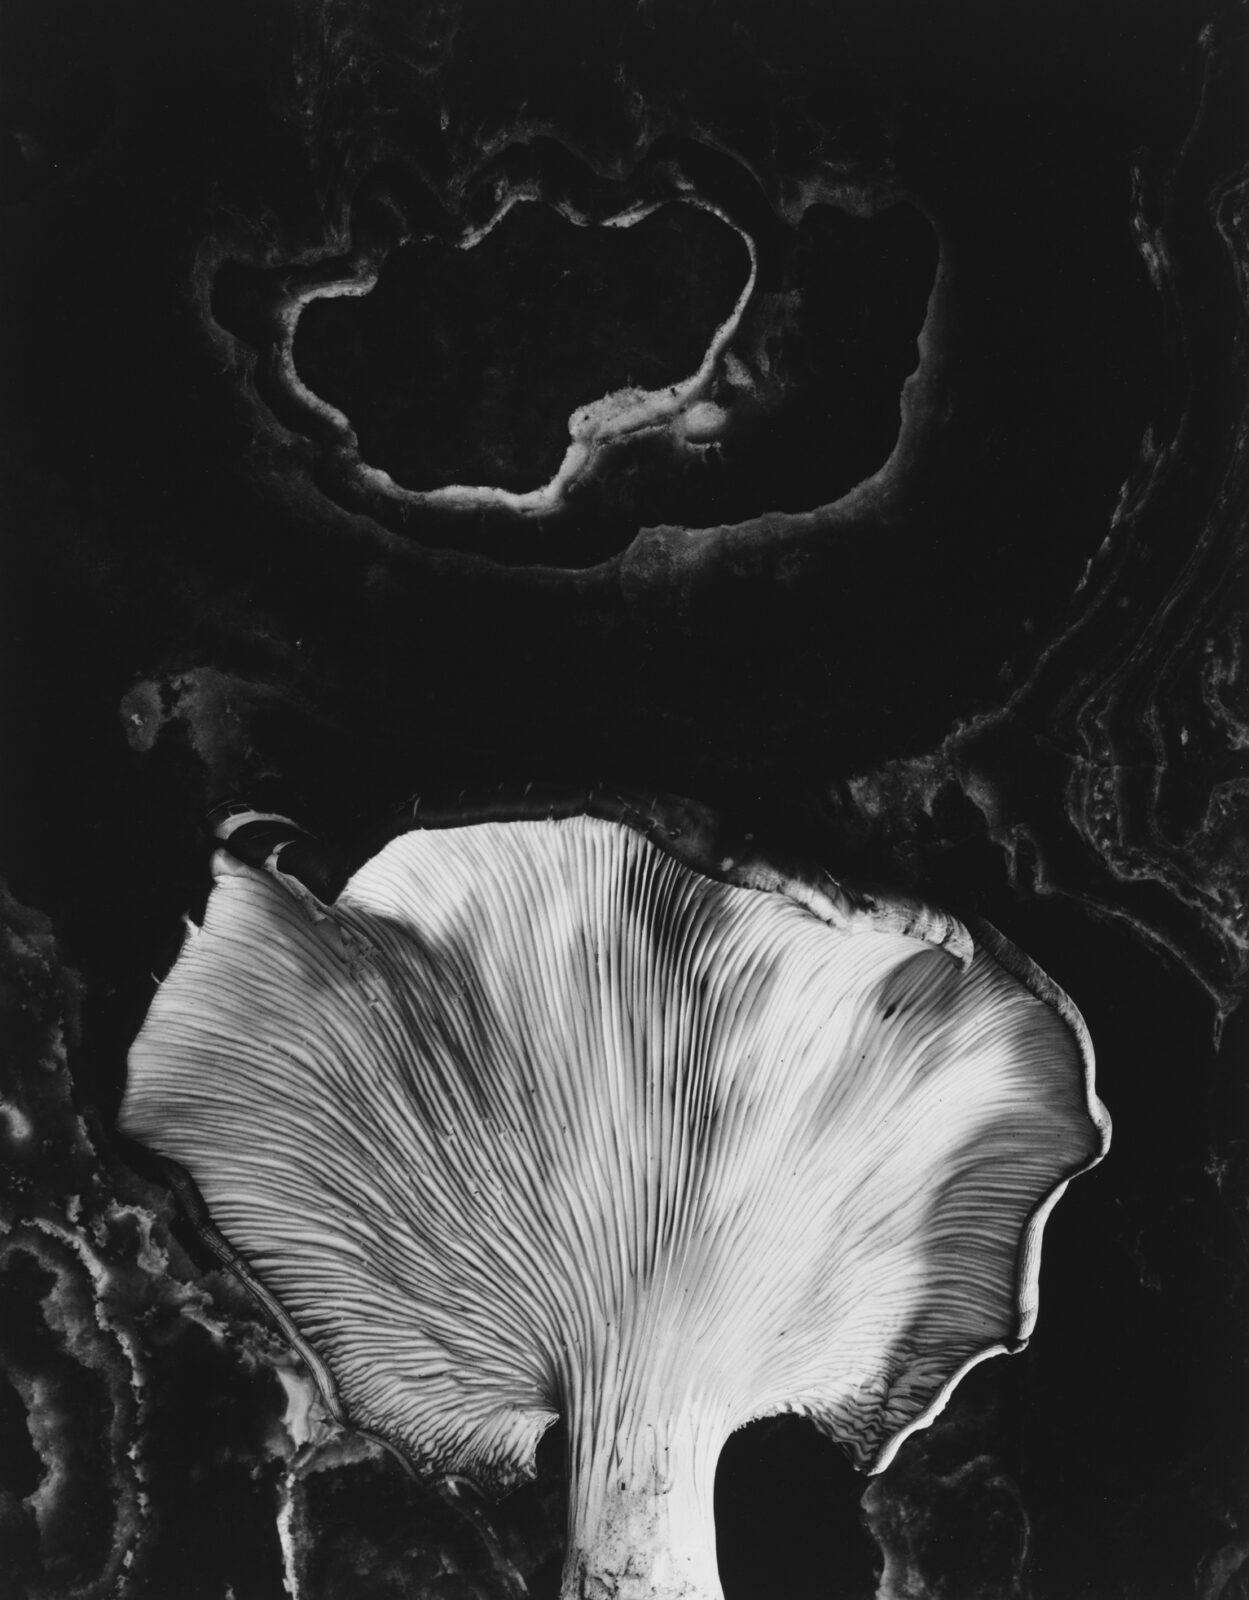 image of paul caponigro's Fungus, Ipswich, MA